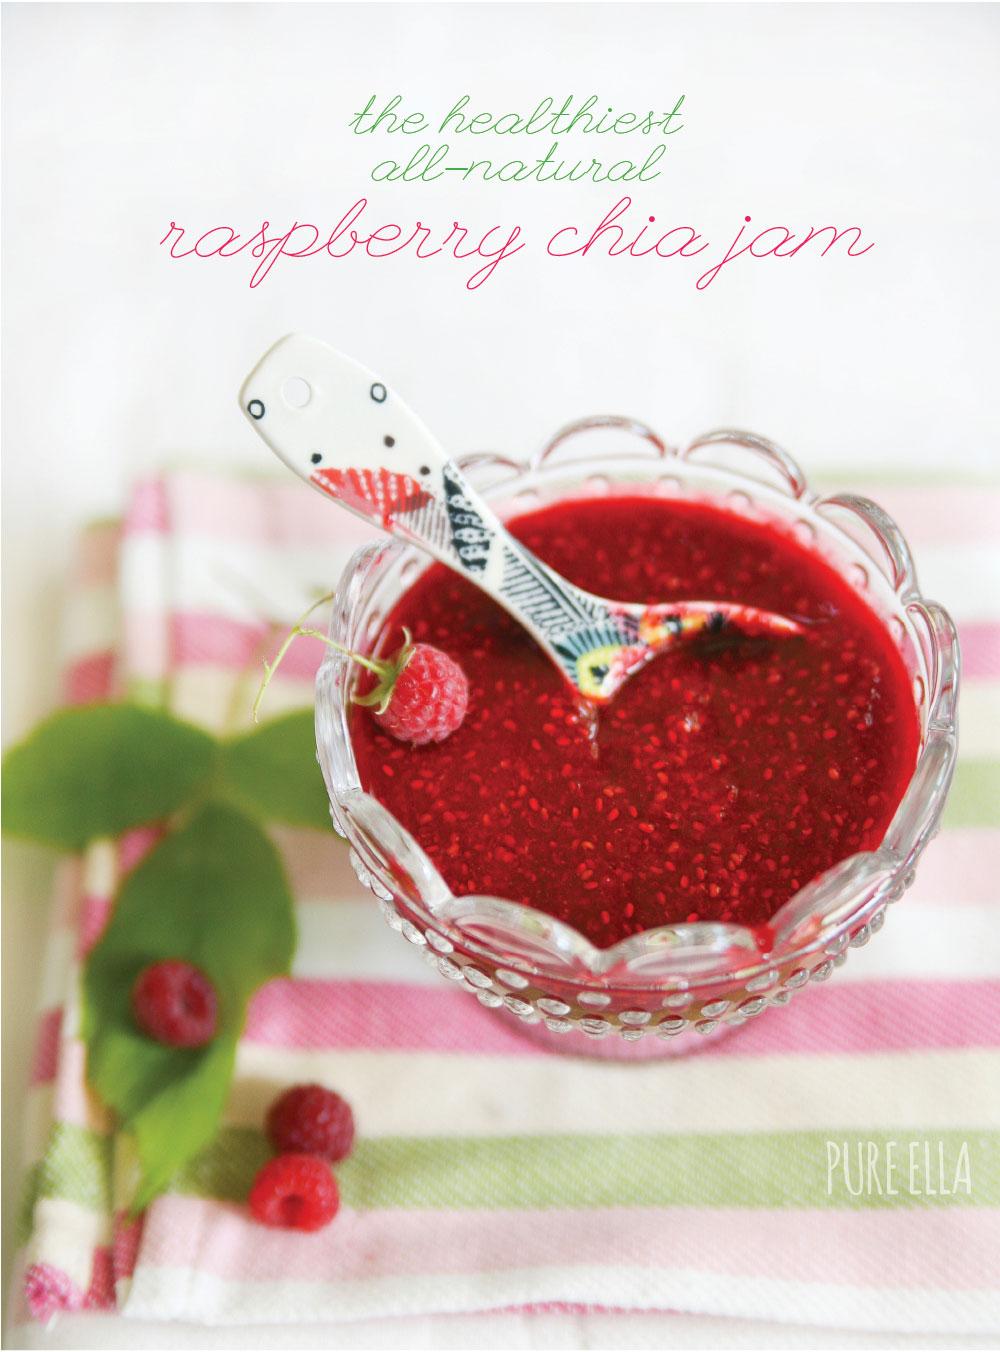 Pure-Ella-Raspberry-Chia-Jam